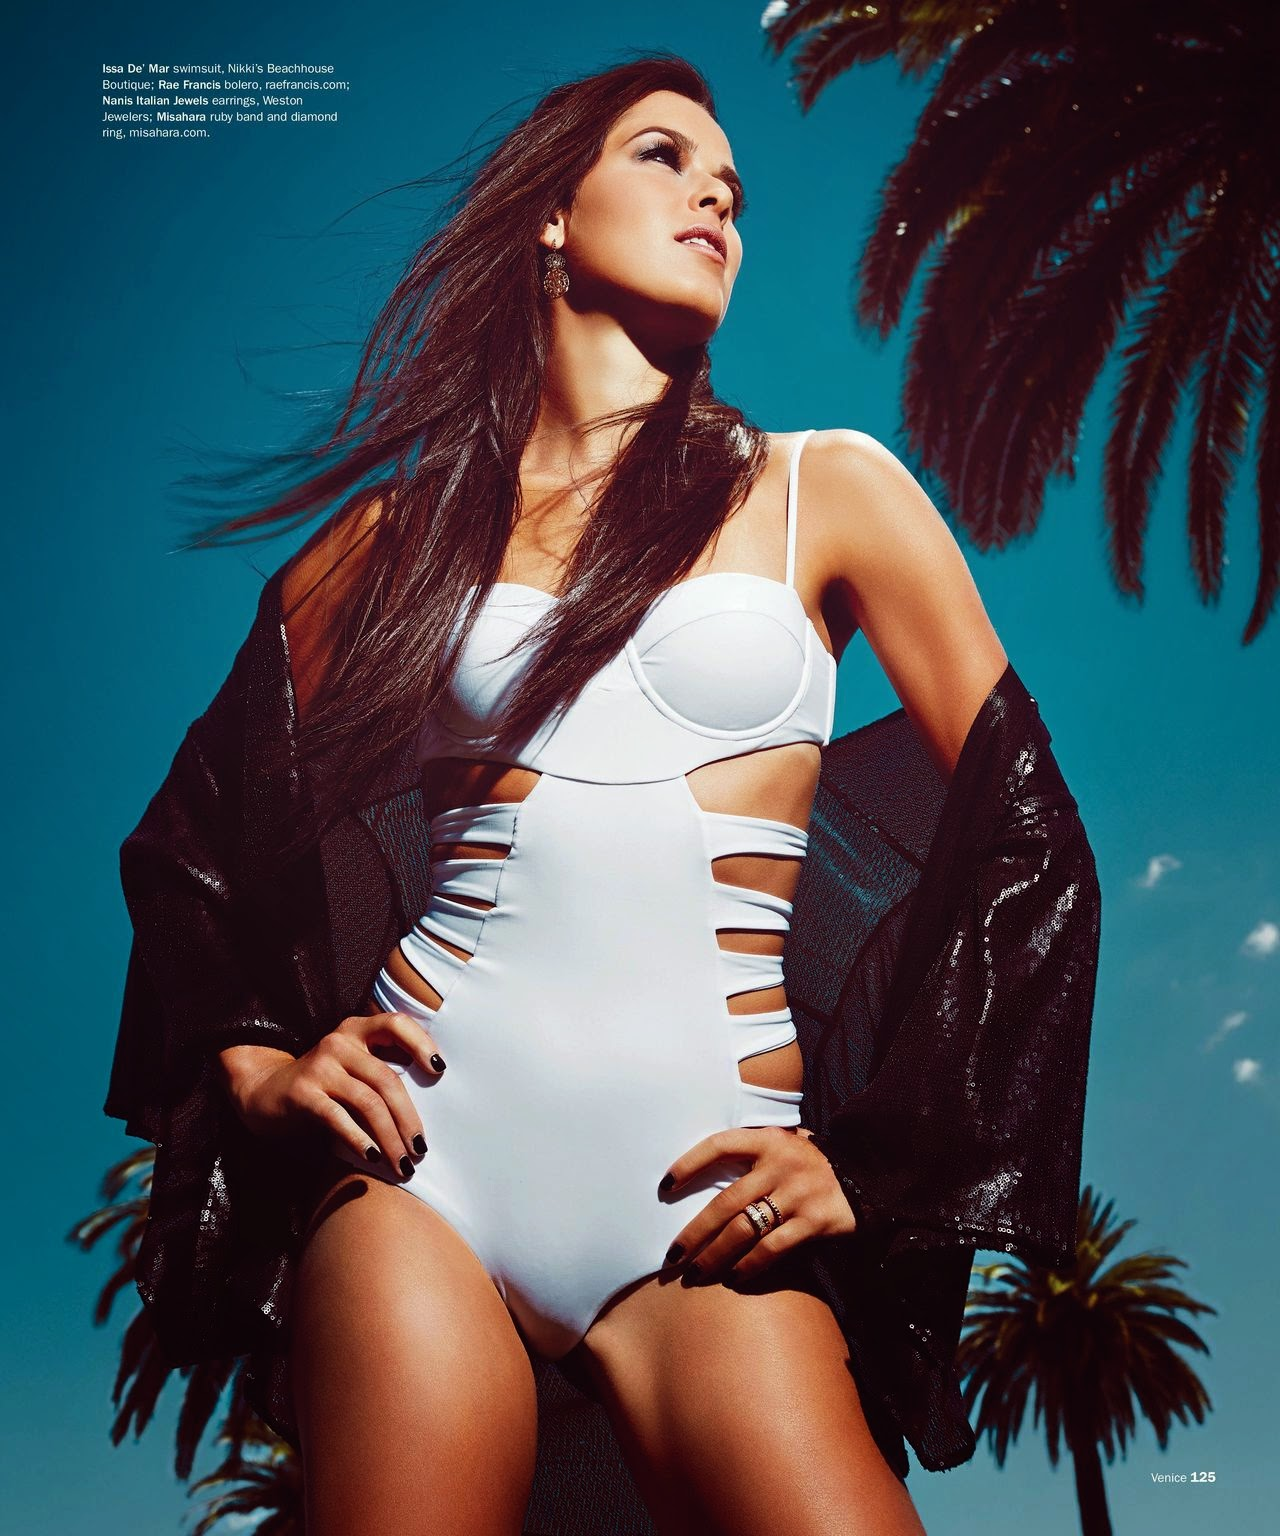 Italian Hotties Good wta hotties: hot shot: ana ivanovic swimsuit photos for venice